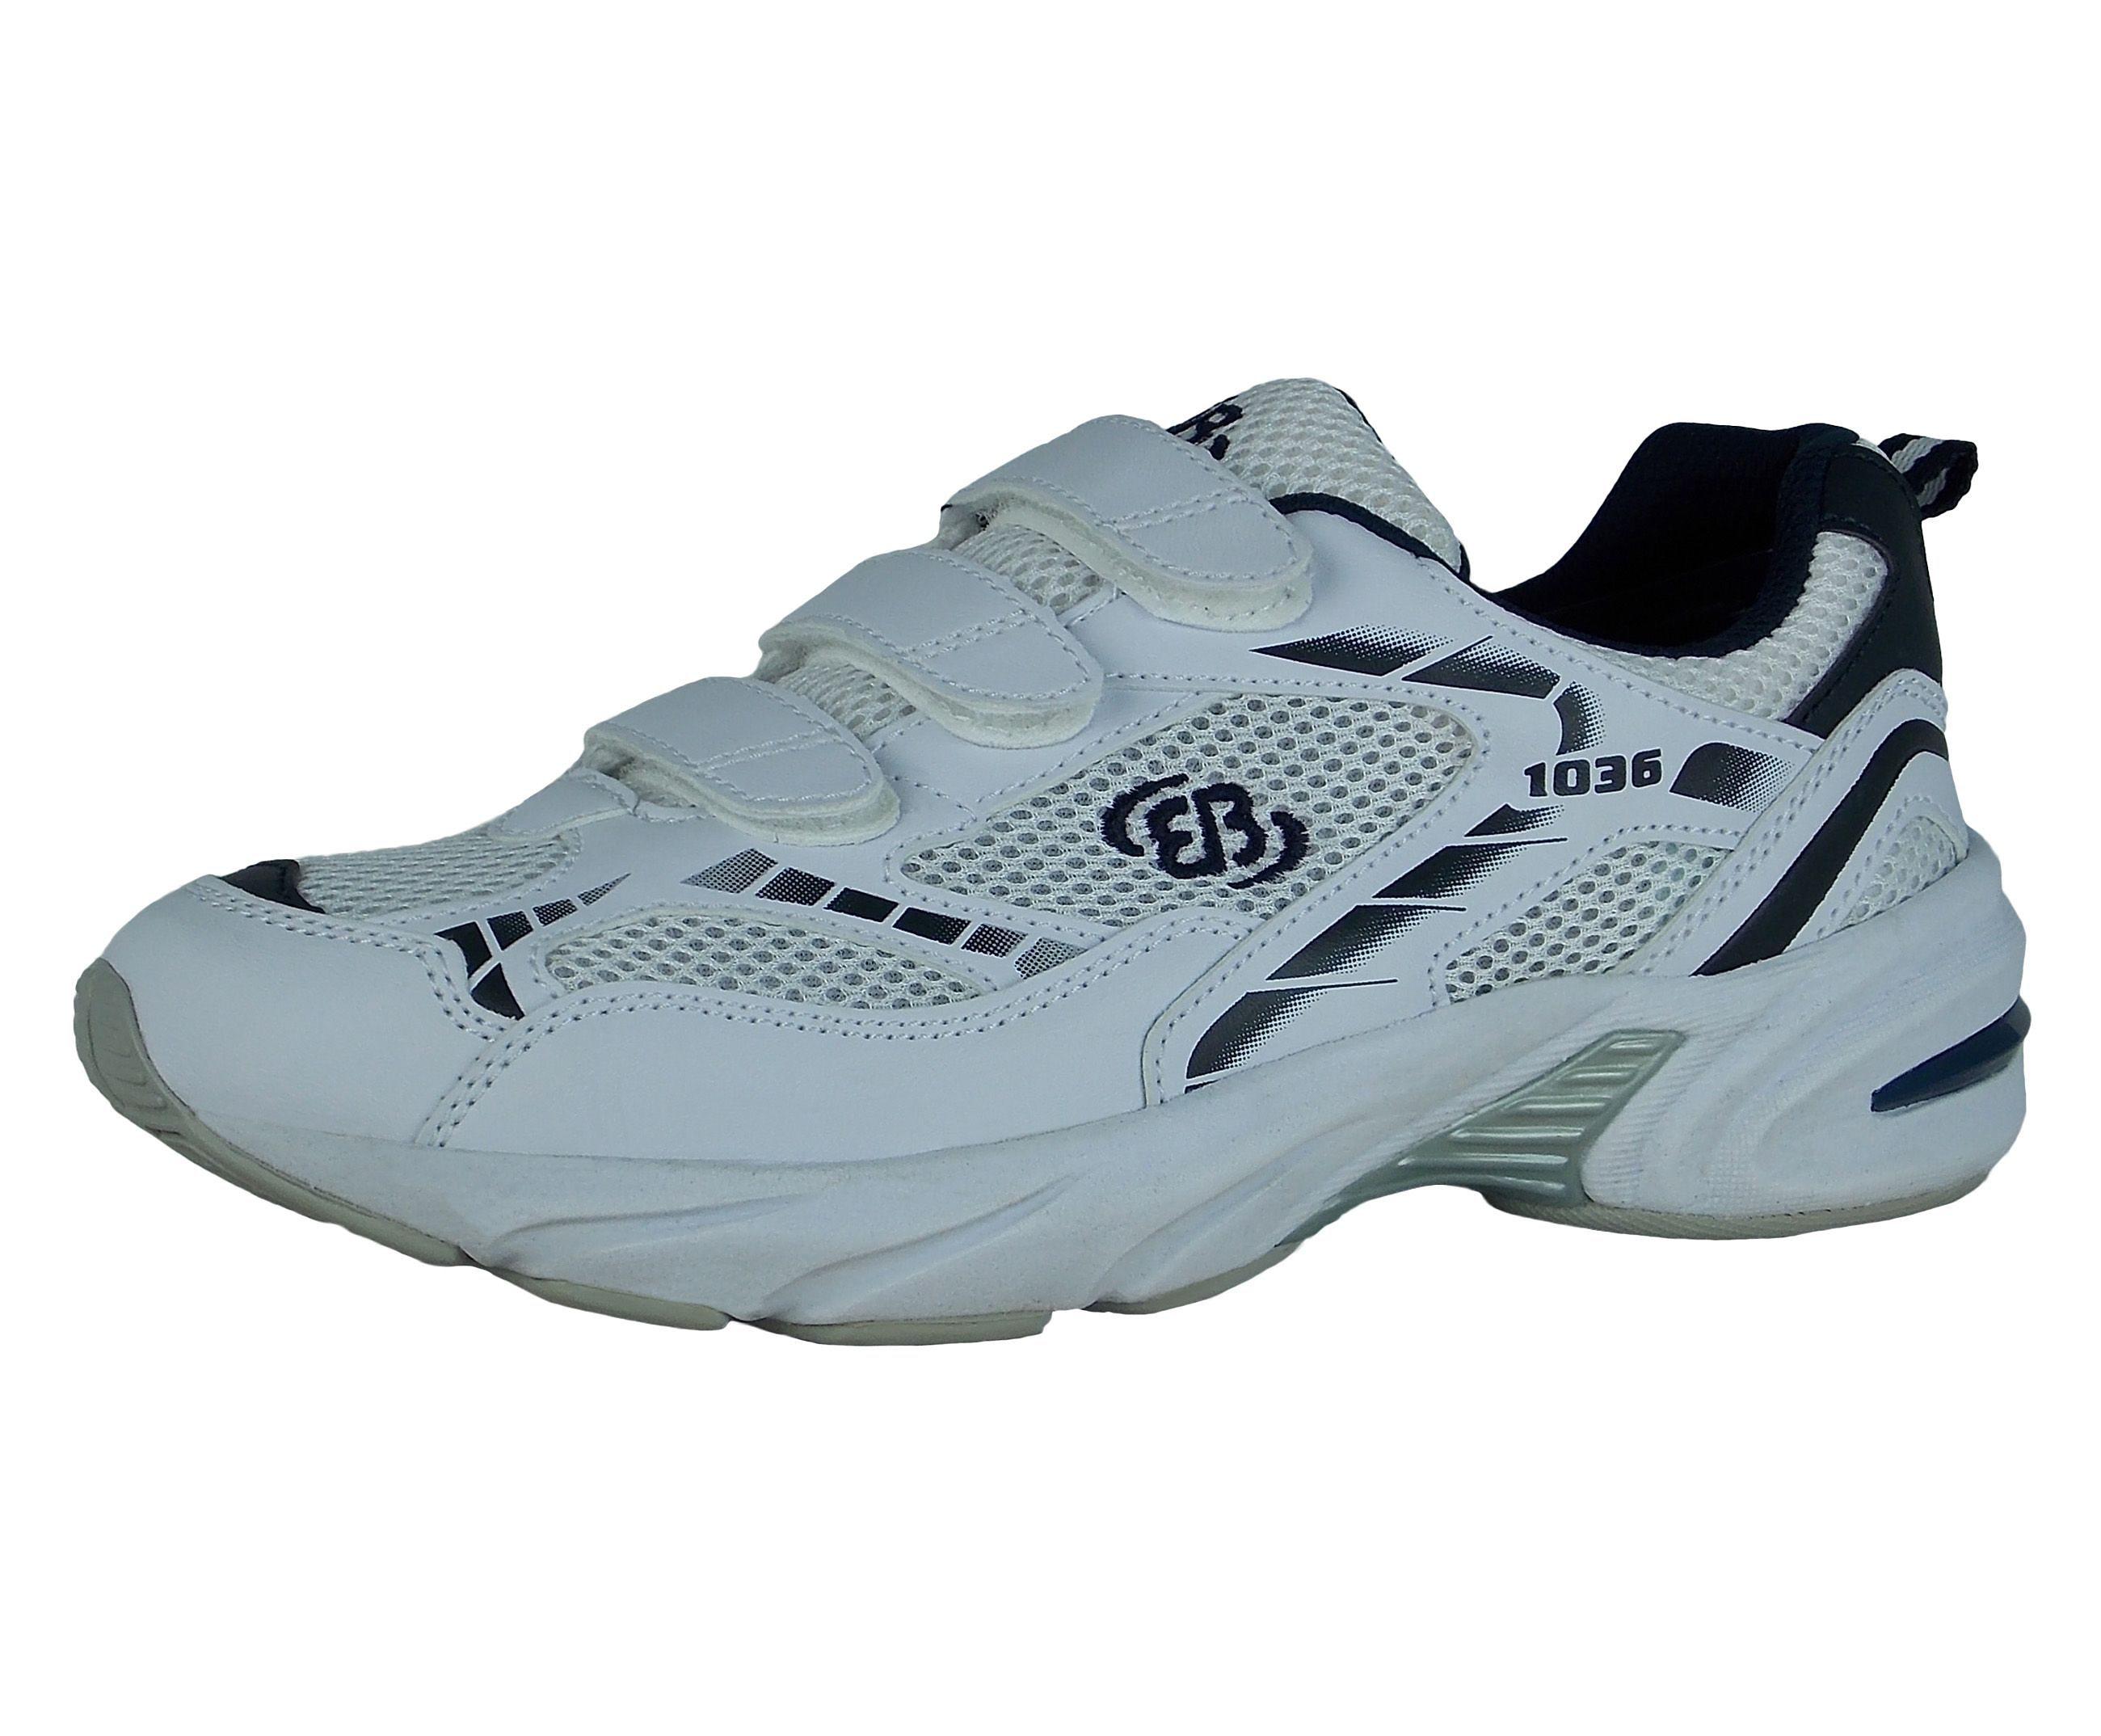 Brütting Joggingschuh mit Klettverschluss - atungsaktives Nylon FORCE V online kaufen  WEISS#ft5_slash#BLAU#ft5_slash#SILBER